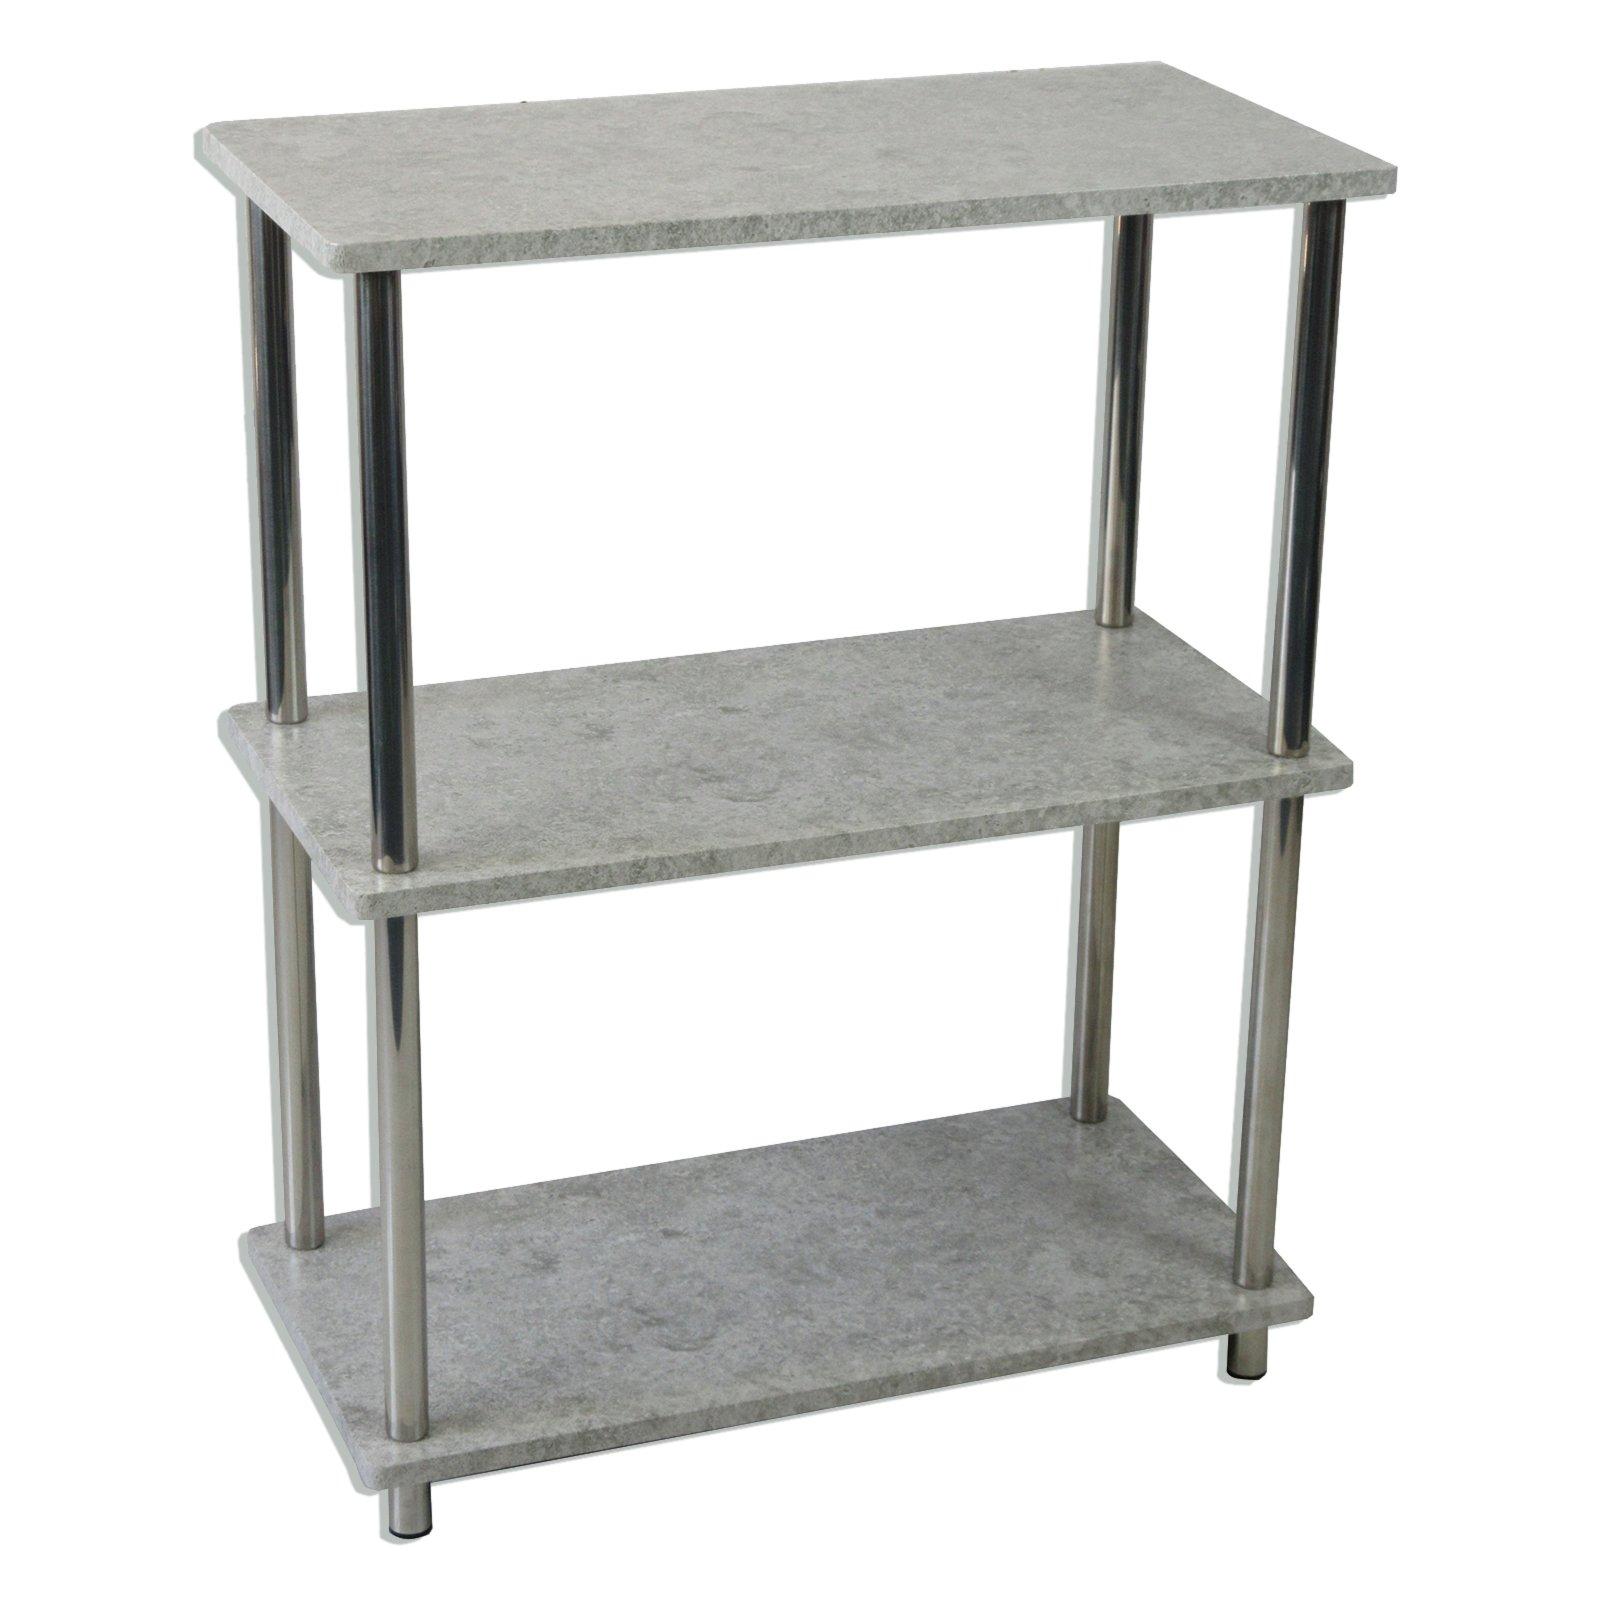 regal grau betonoptik 60 cm breit online bei. Black Bedroom Furniture Sets. Home Design Ideas